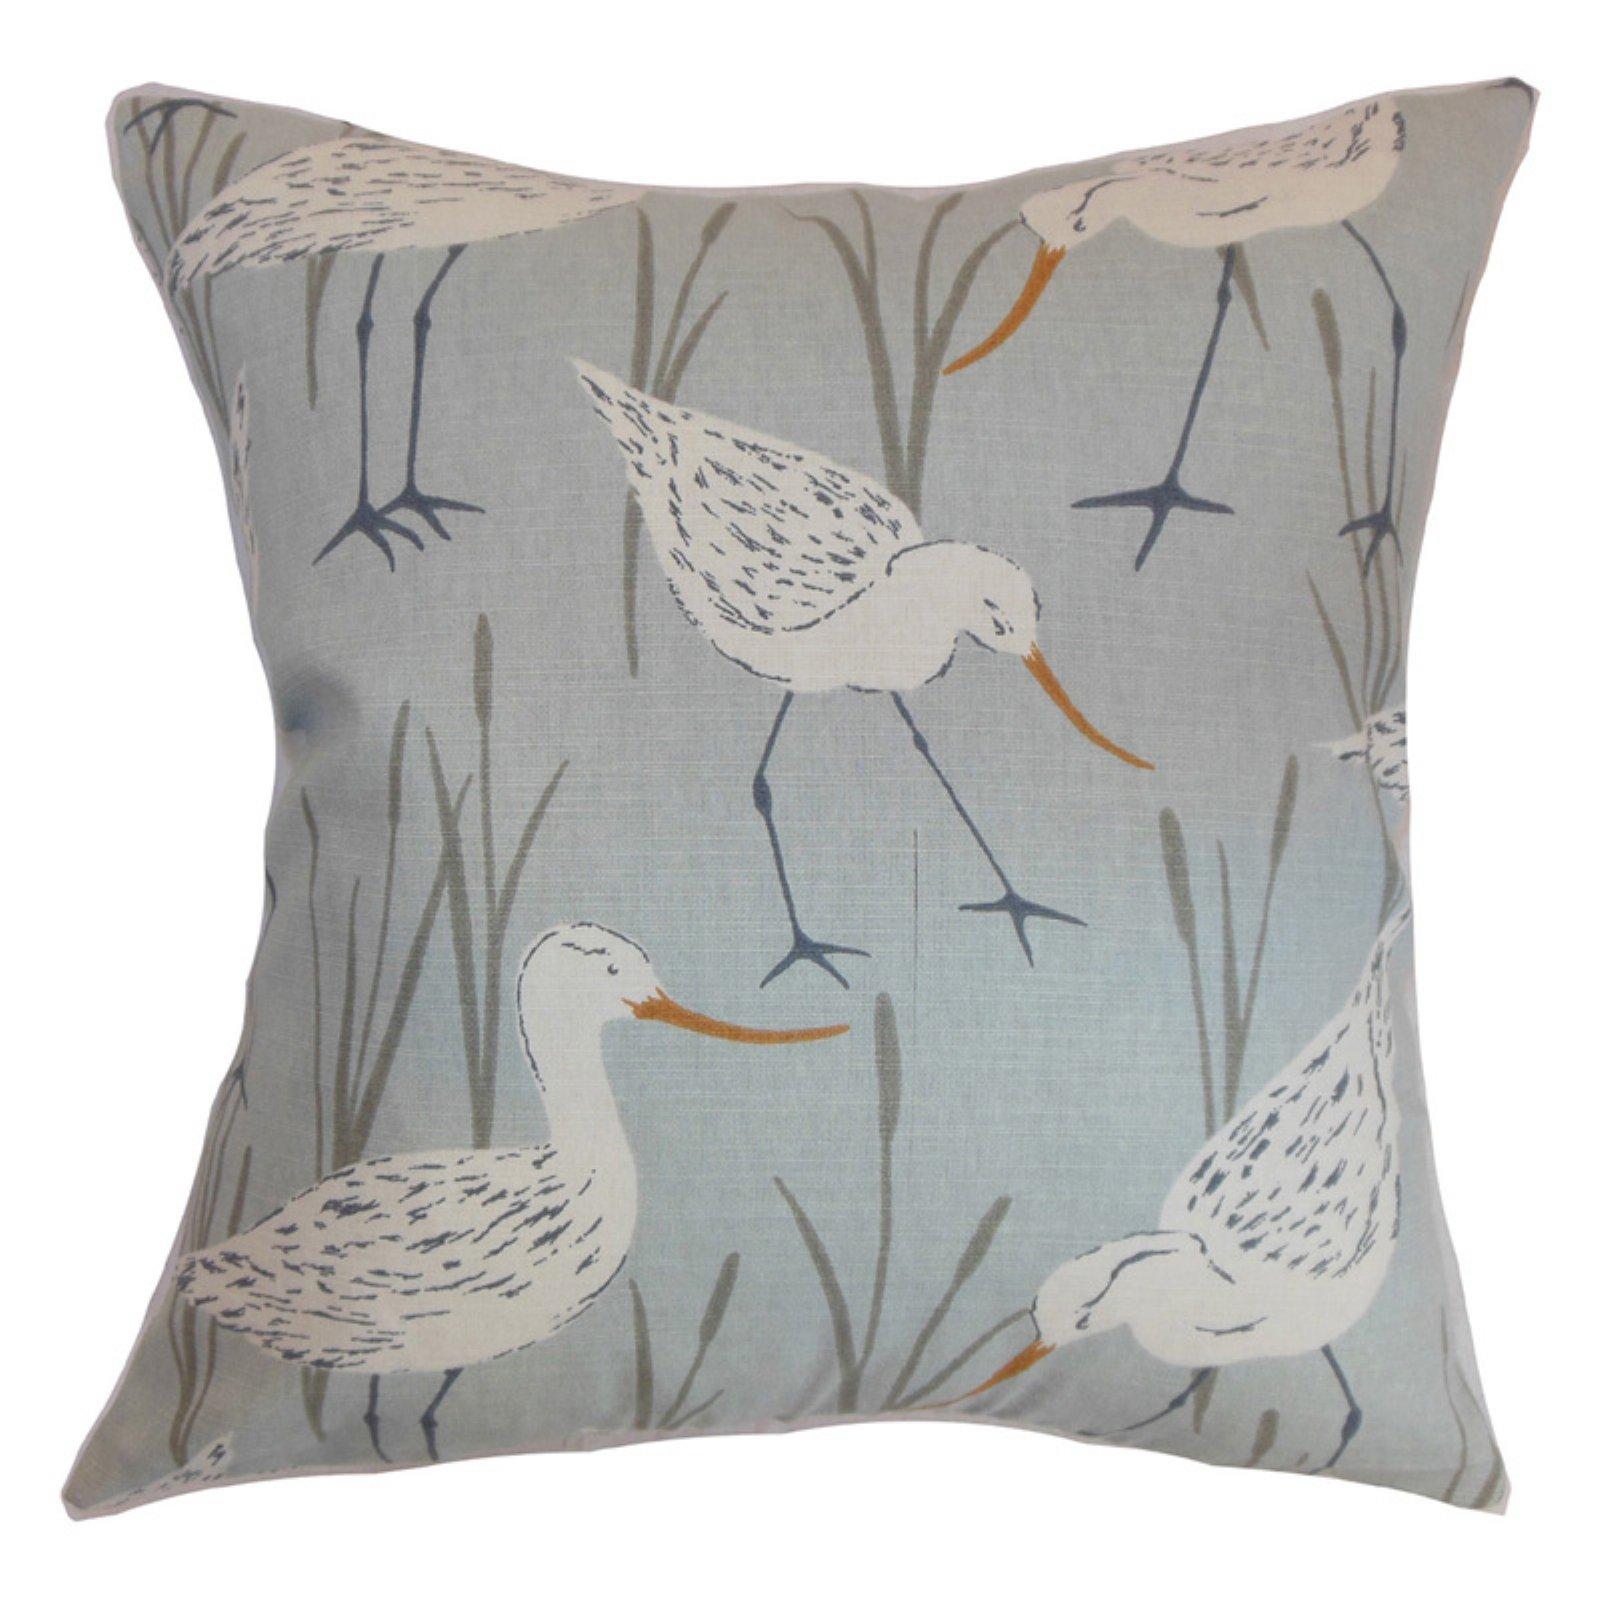 The Pillow Collection Joensuu Animal Pillow